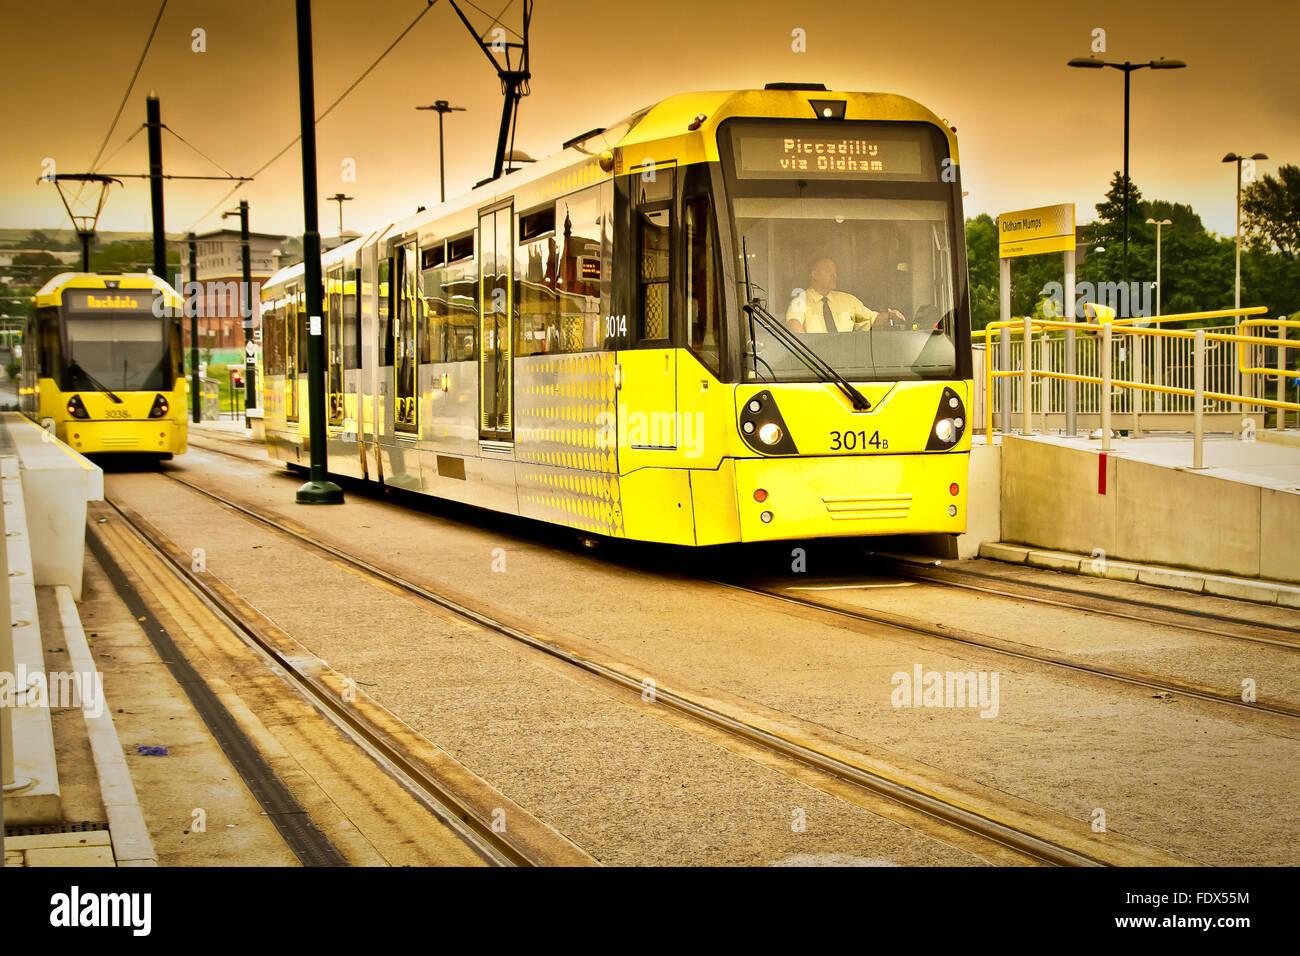 Trams arriving at Mumps Bridge Station, Oldham, Lancashire, UK - Stock Image